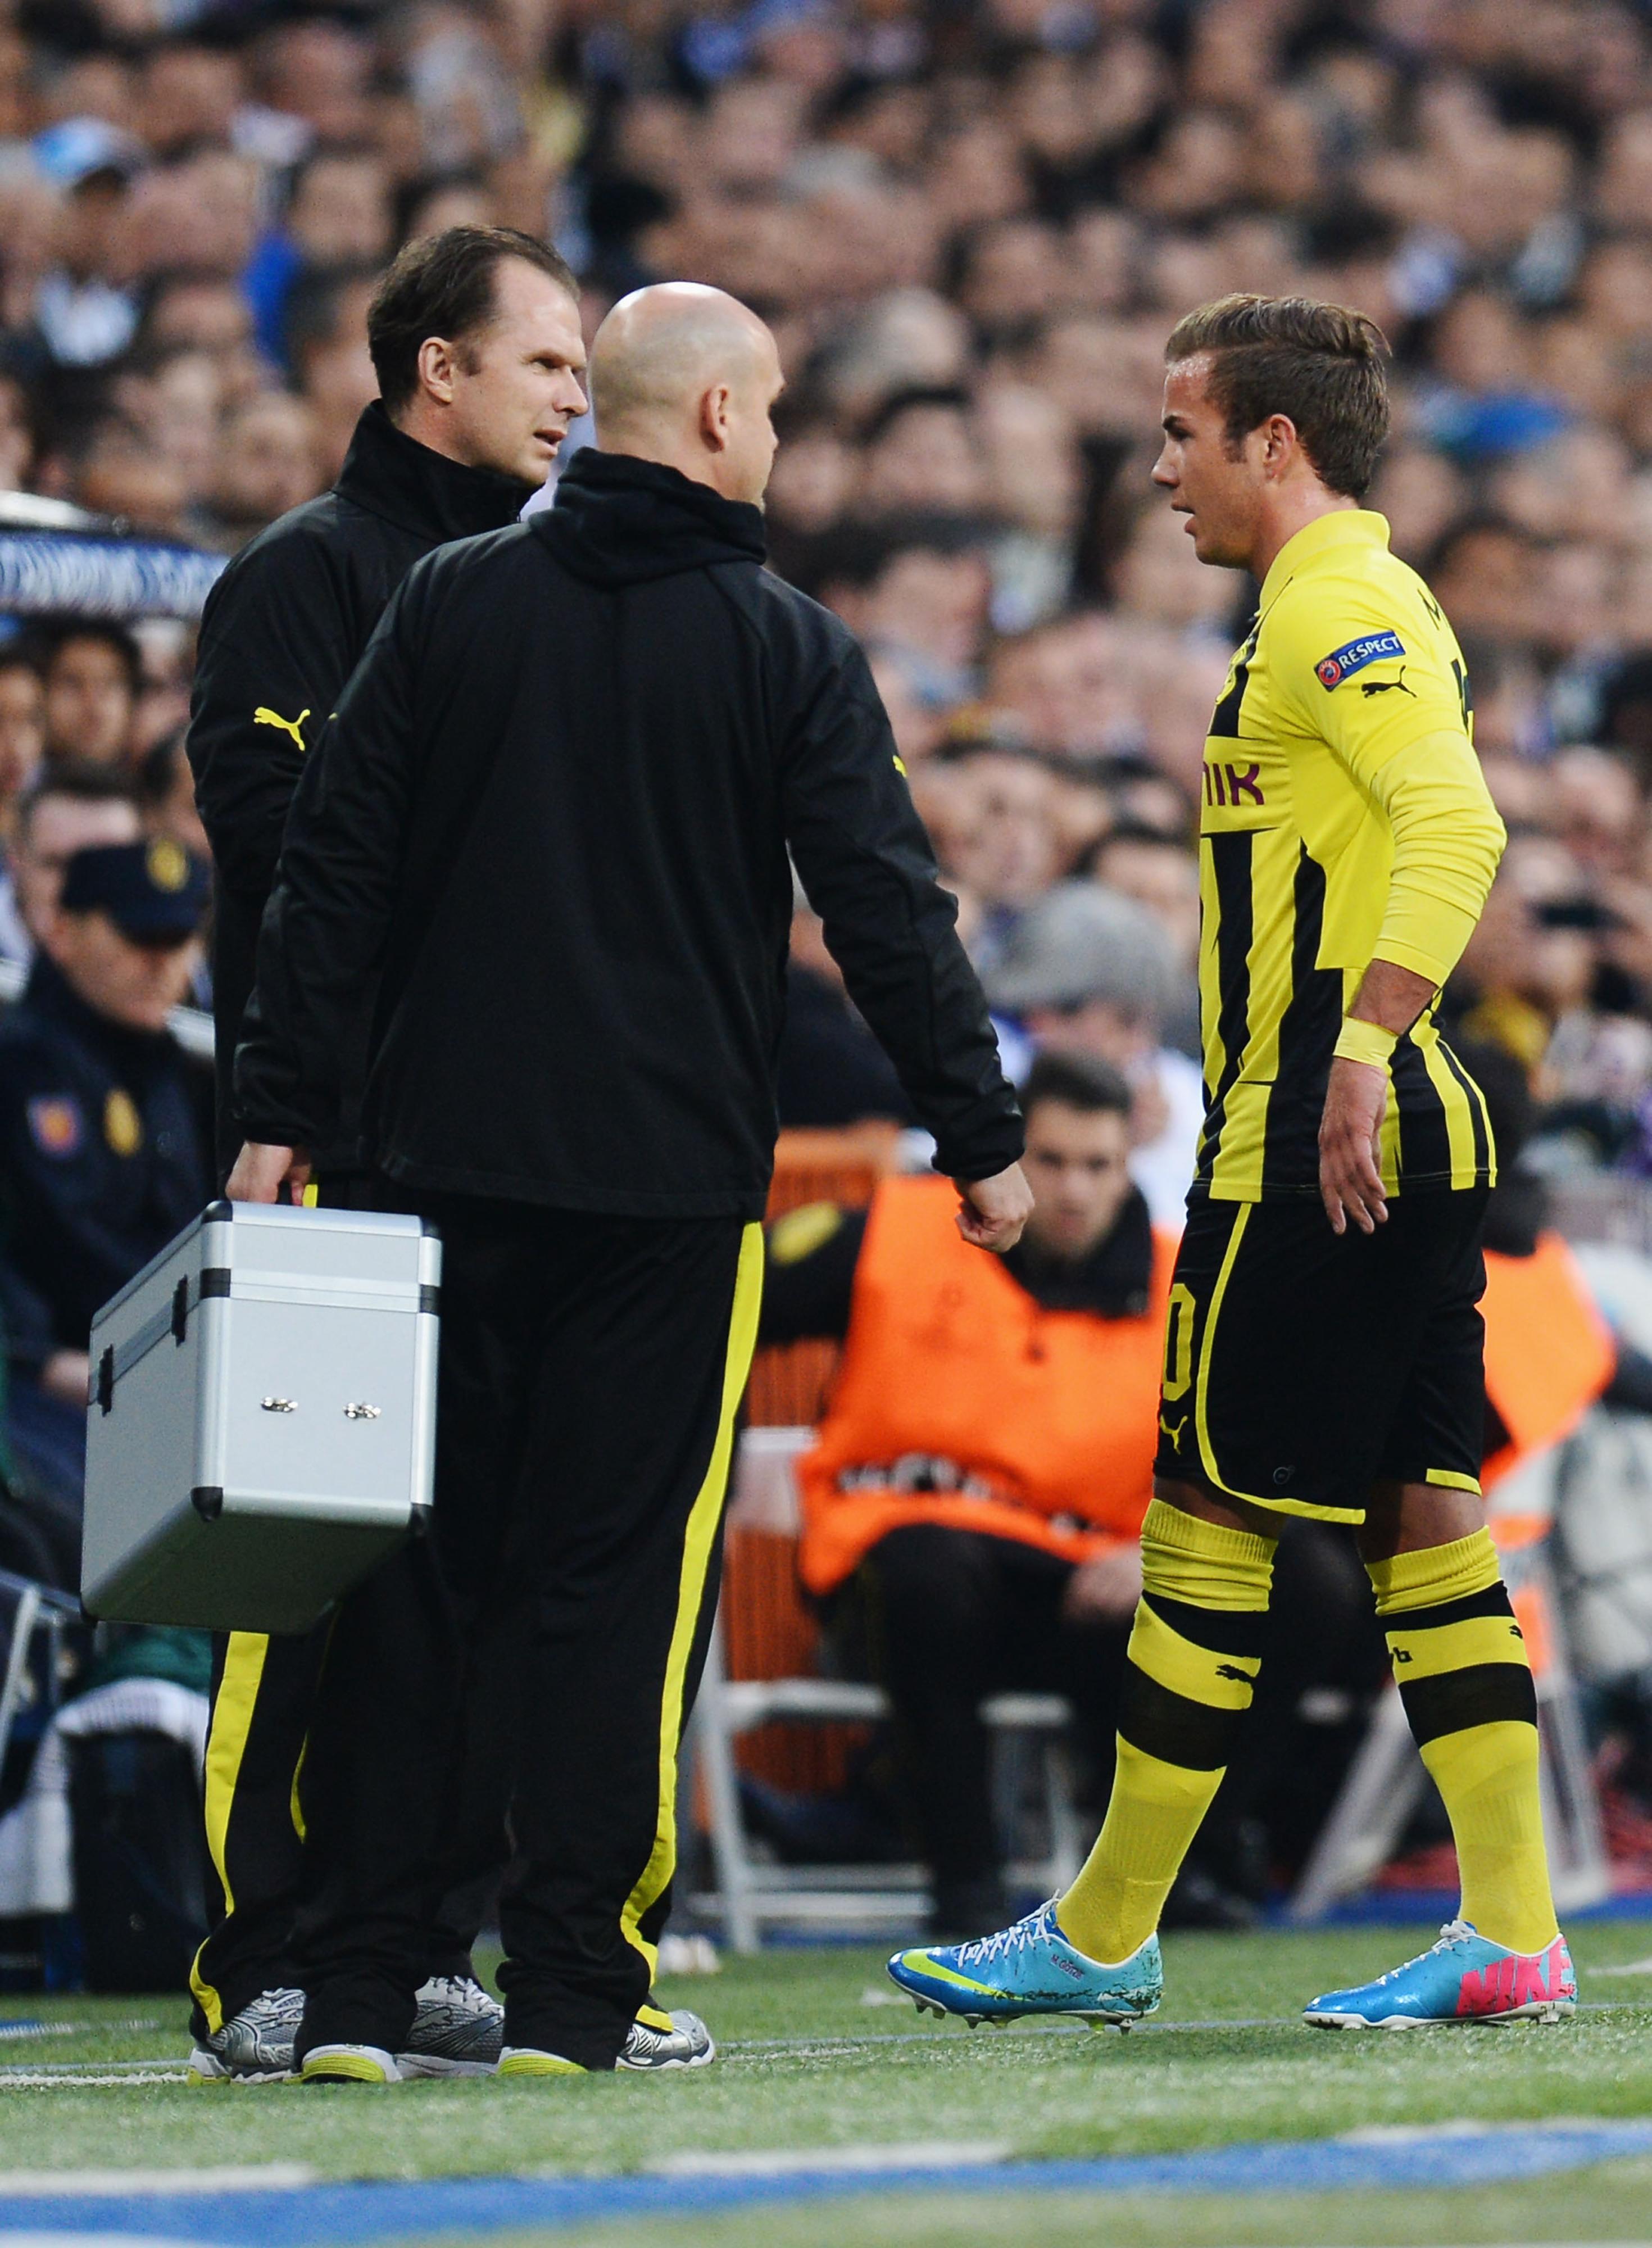 Mario Götze injury: Midfielder out for Saturday's final